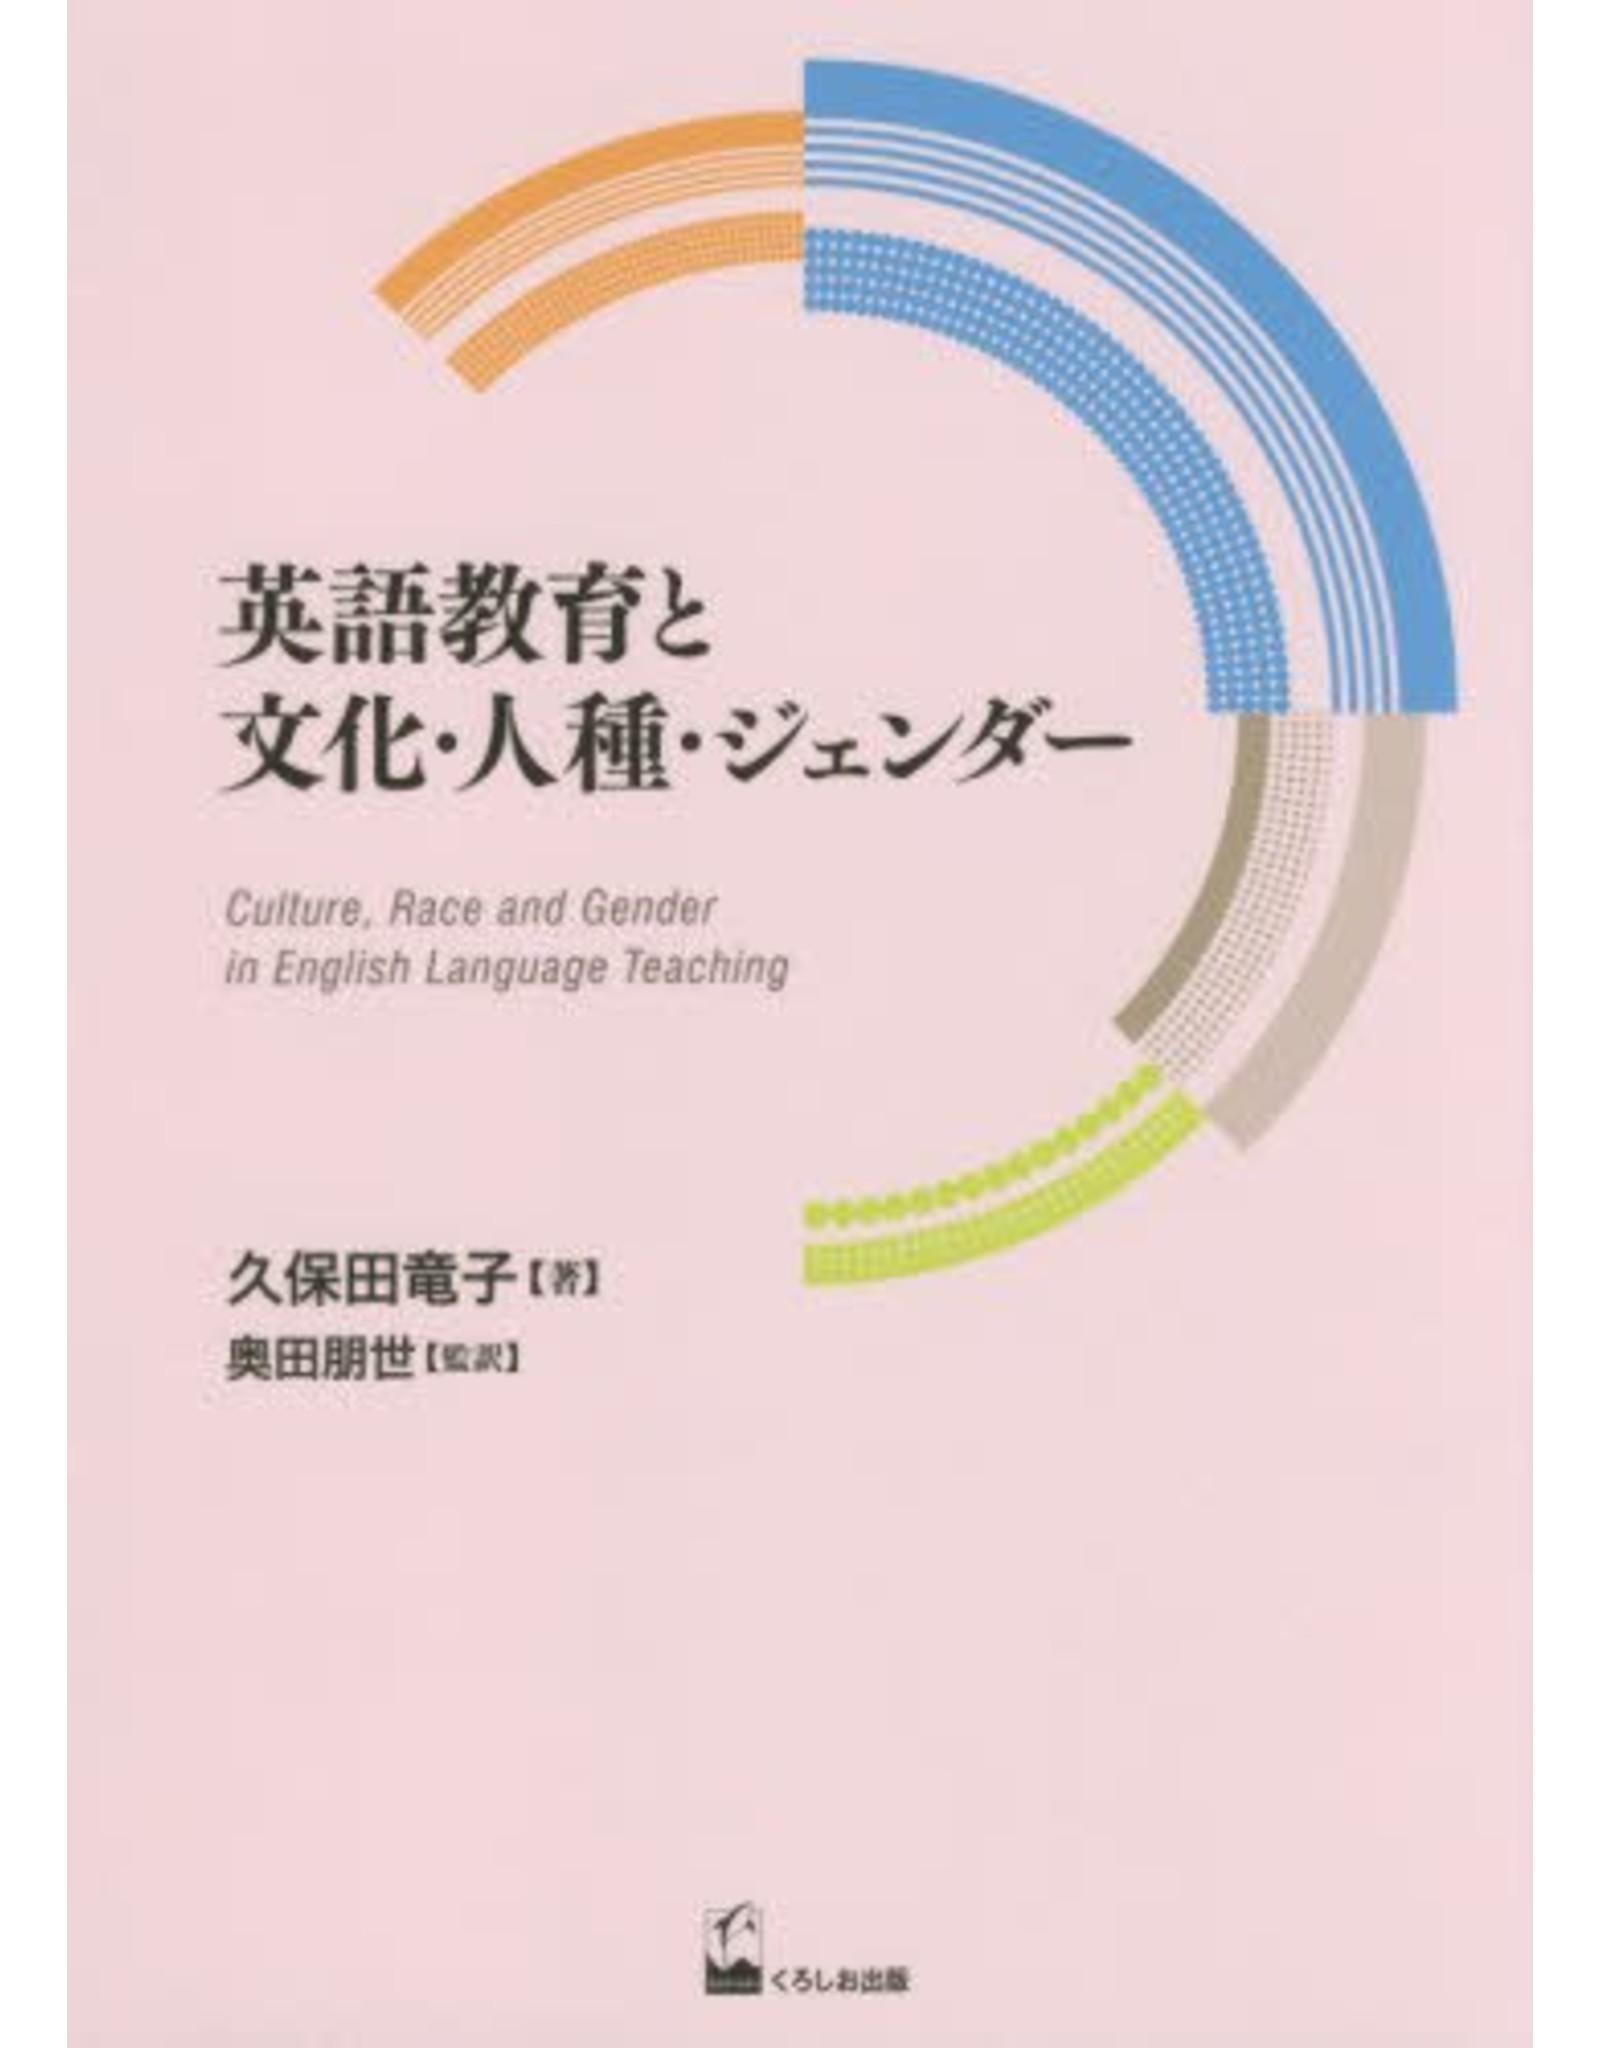 KUROSHIO CULTURE, RACE AND GENDER IN ENGLISH LANGUAGE TEACHING